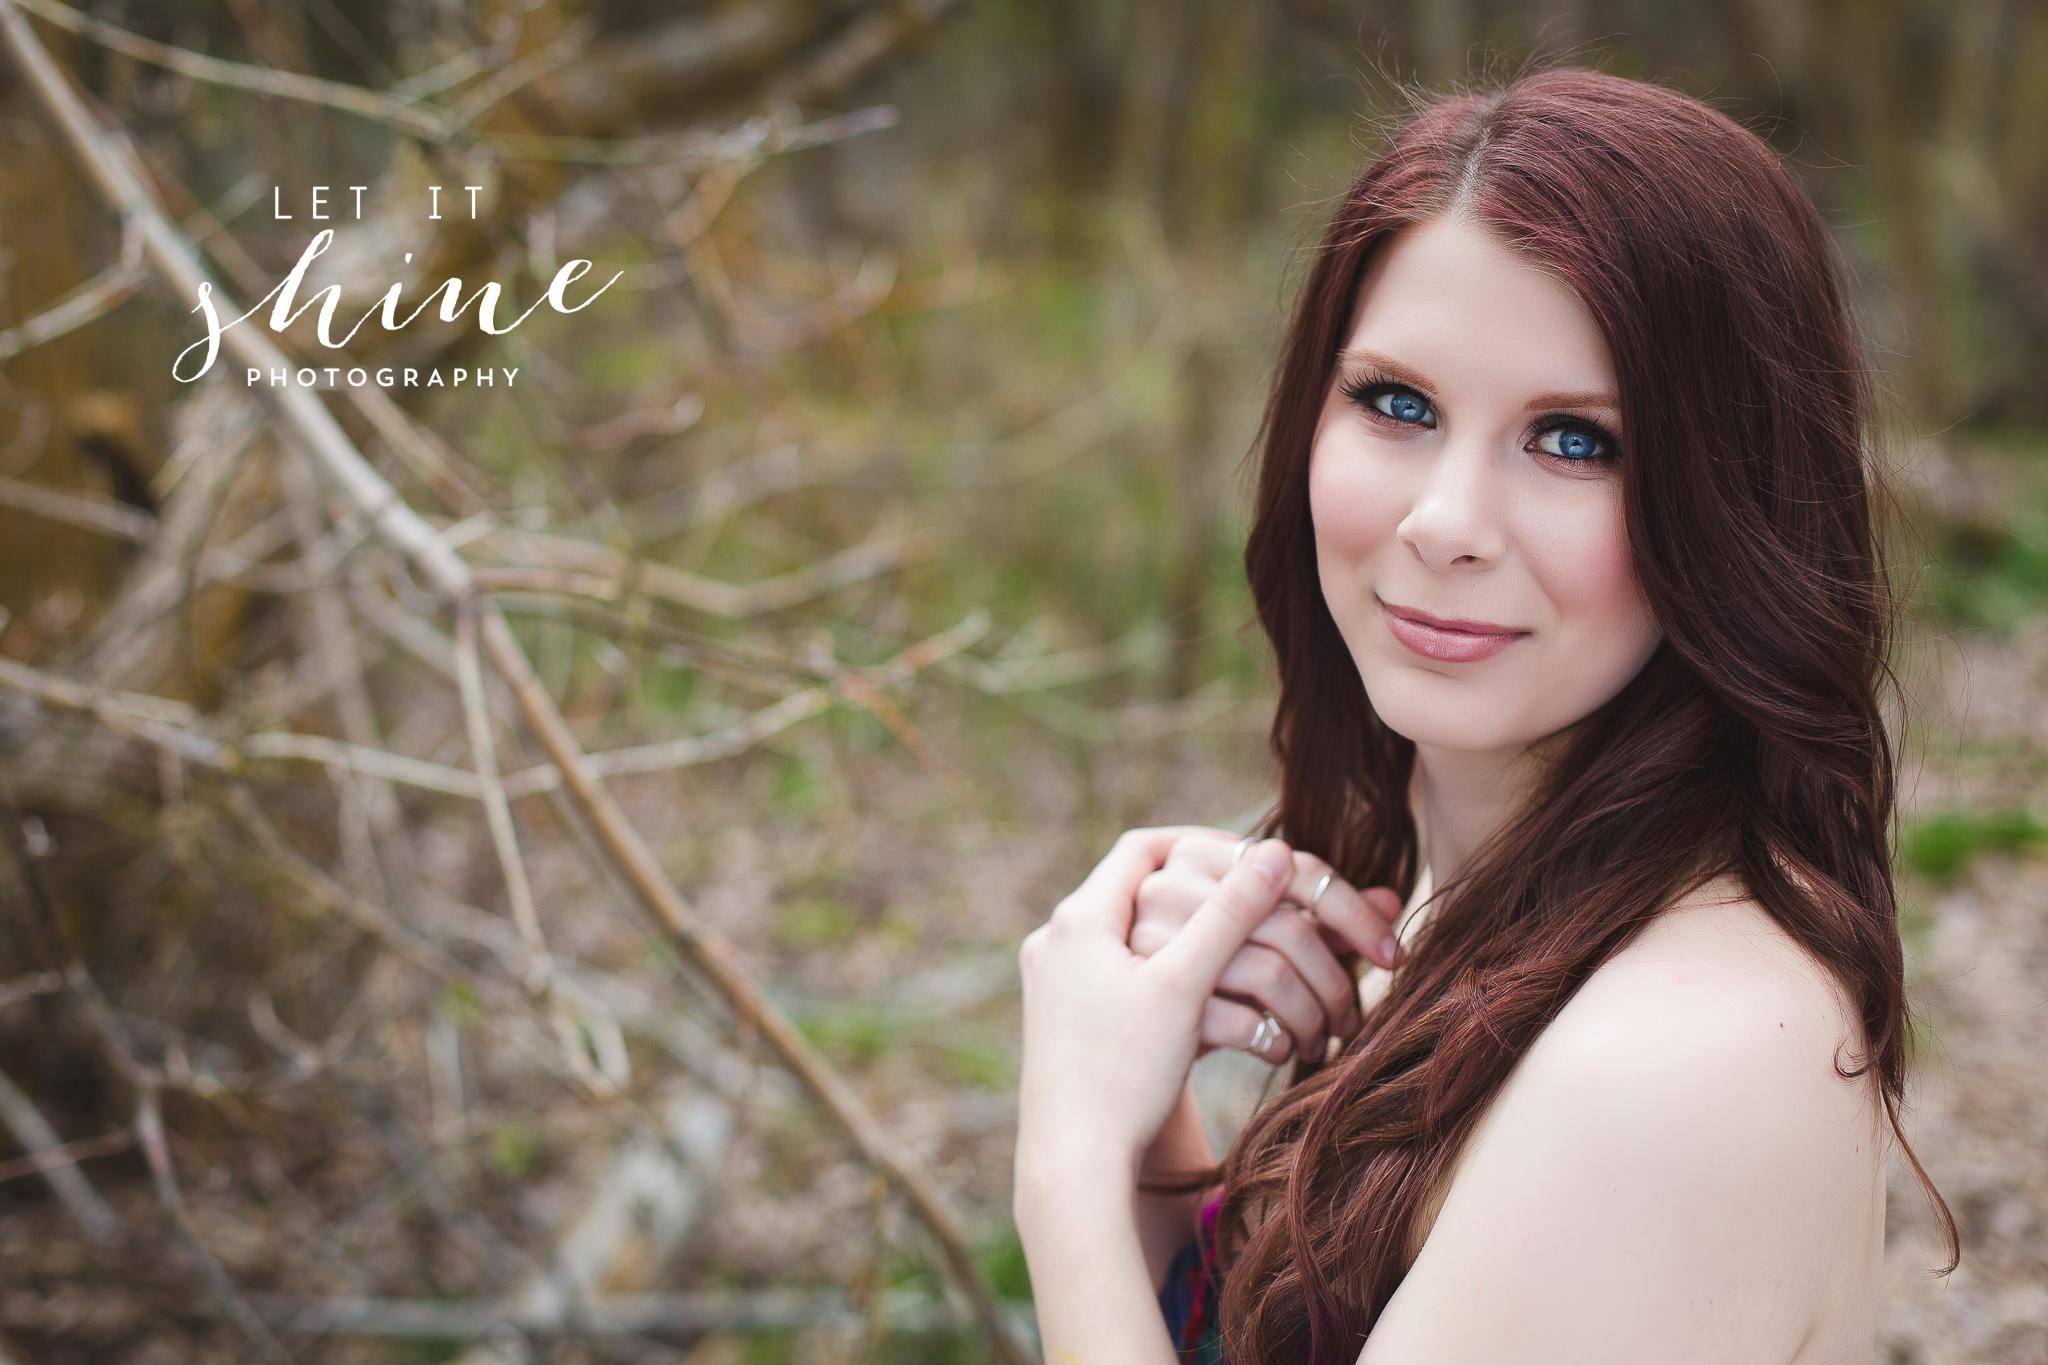 Boise Senior Photography- Let it Shine Photography-3299.jpg